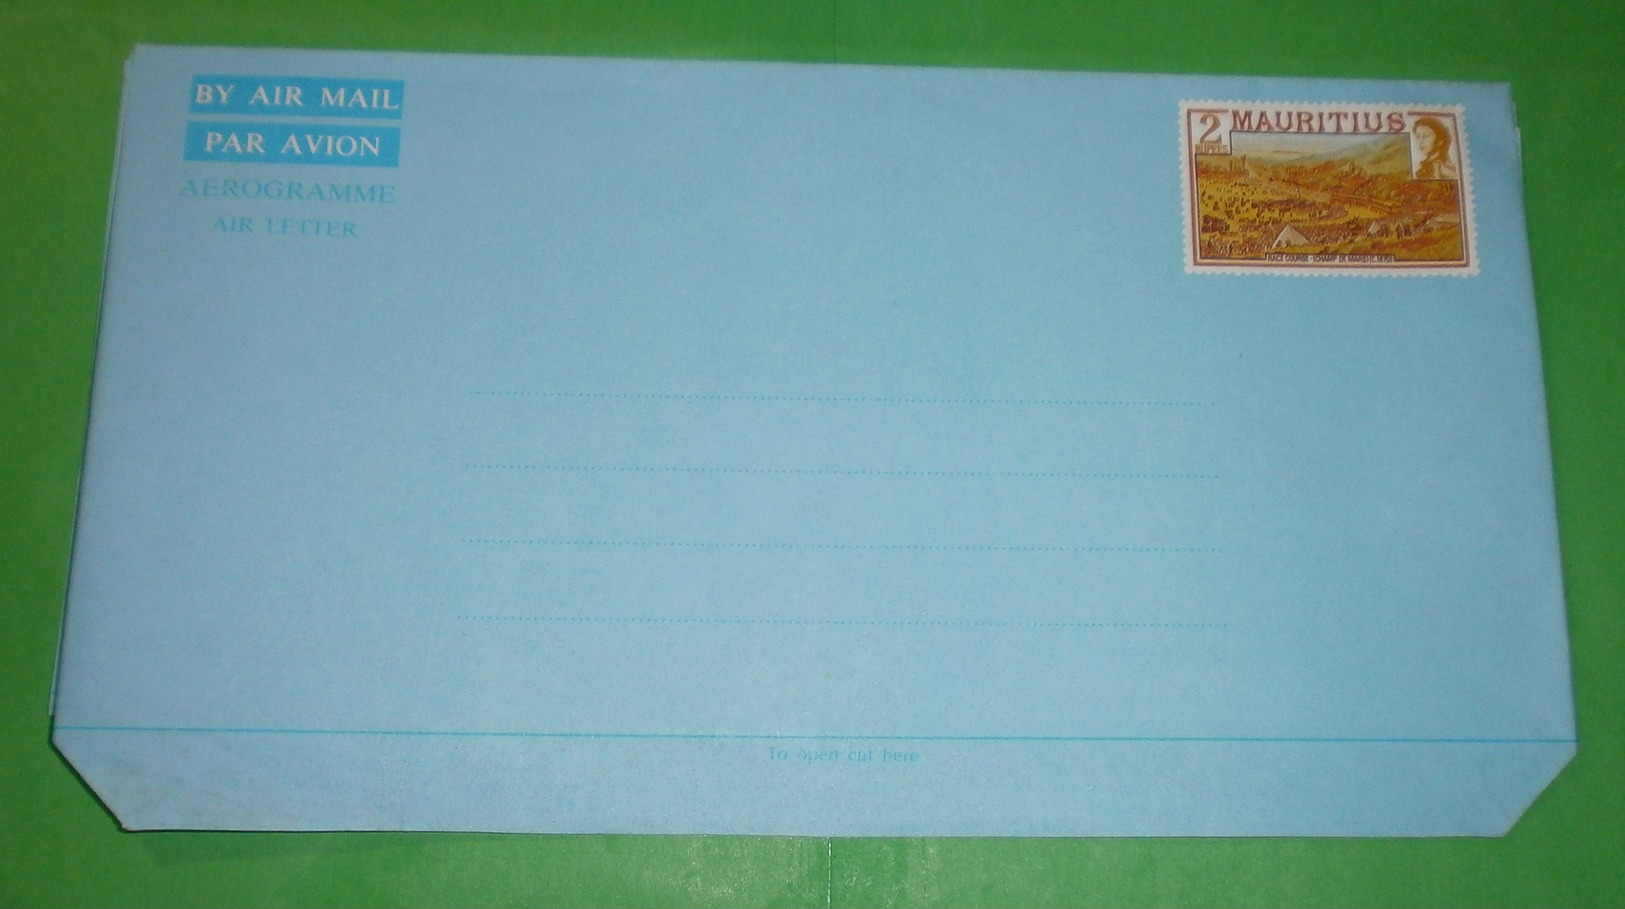 MAURITIUS - Aerogramme - Brief Letter Lettre 信 Lettera Carta письмо Brev 手紙 จดหมาย Cover Envelope (2 Foto)(x034443) - Mauritius (1968-...)